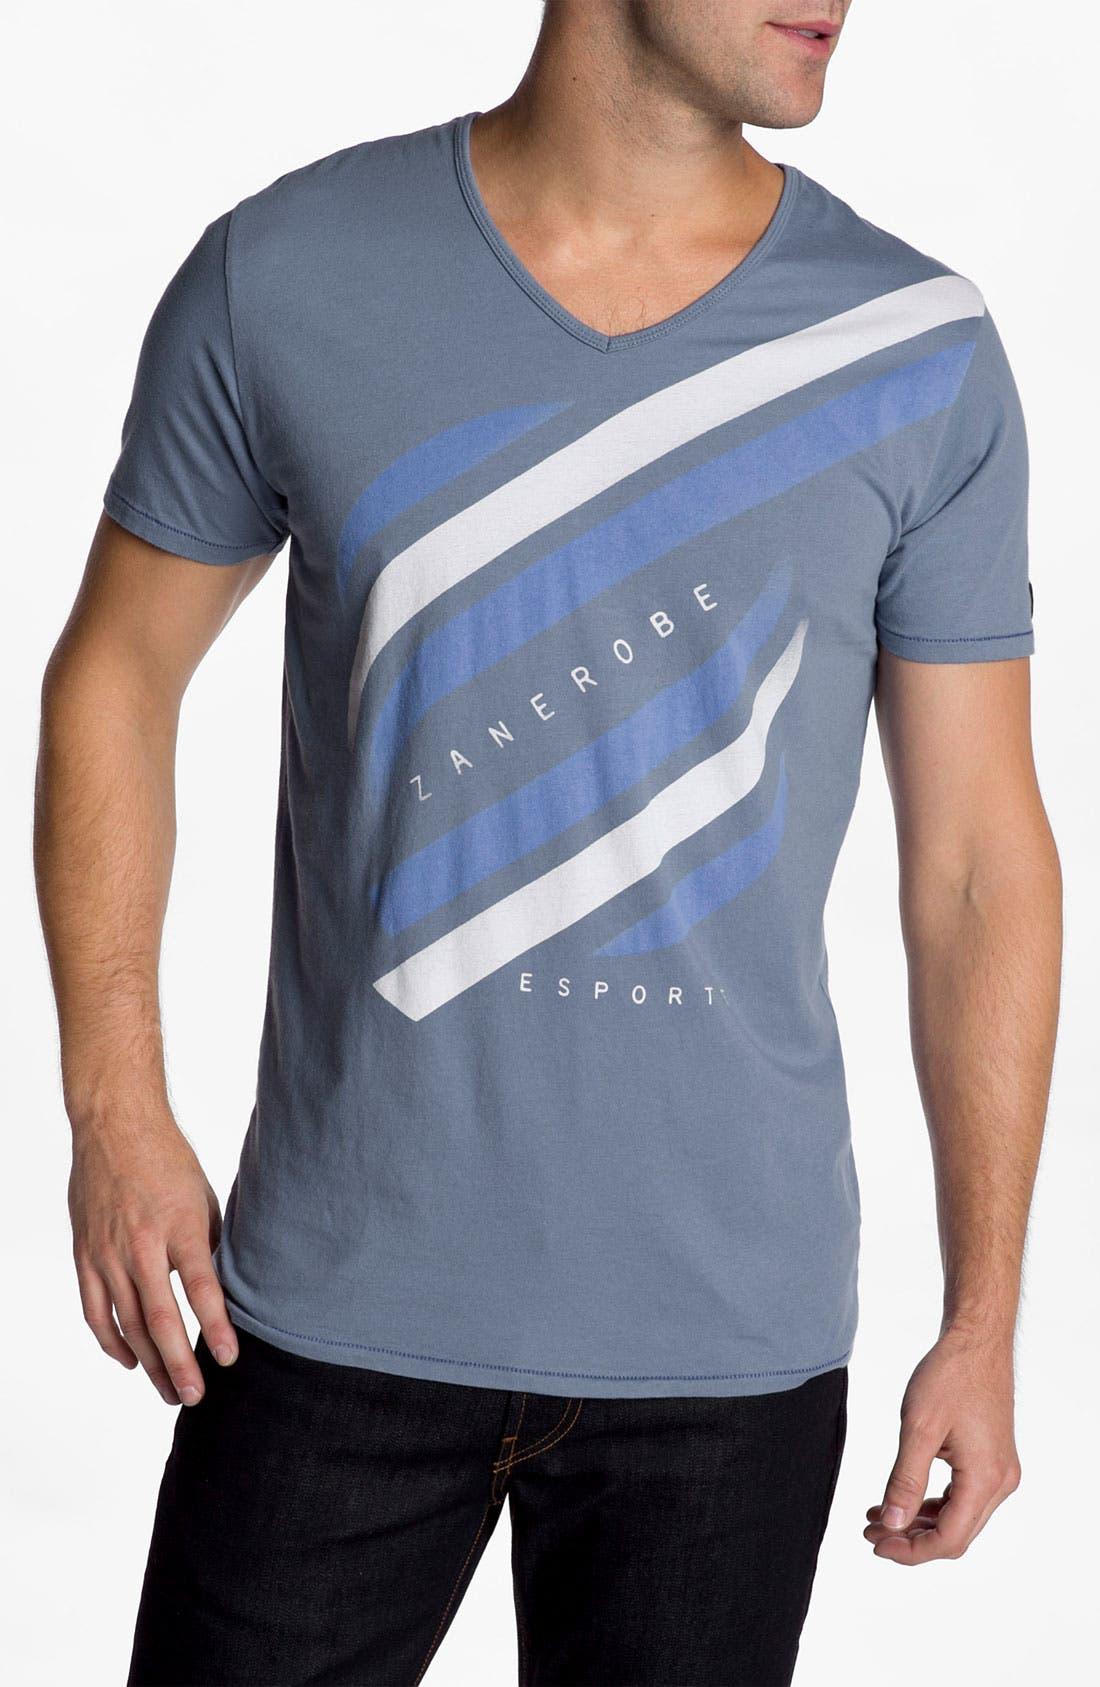 Alternate Image 1 Selected - Zanerobe 'Esporte' T-Shirt